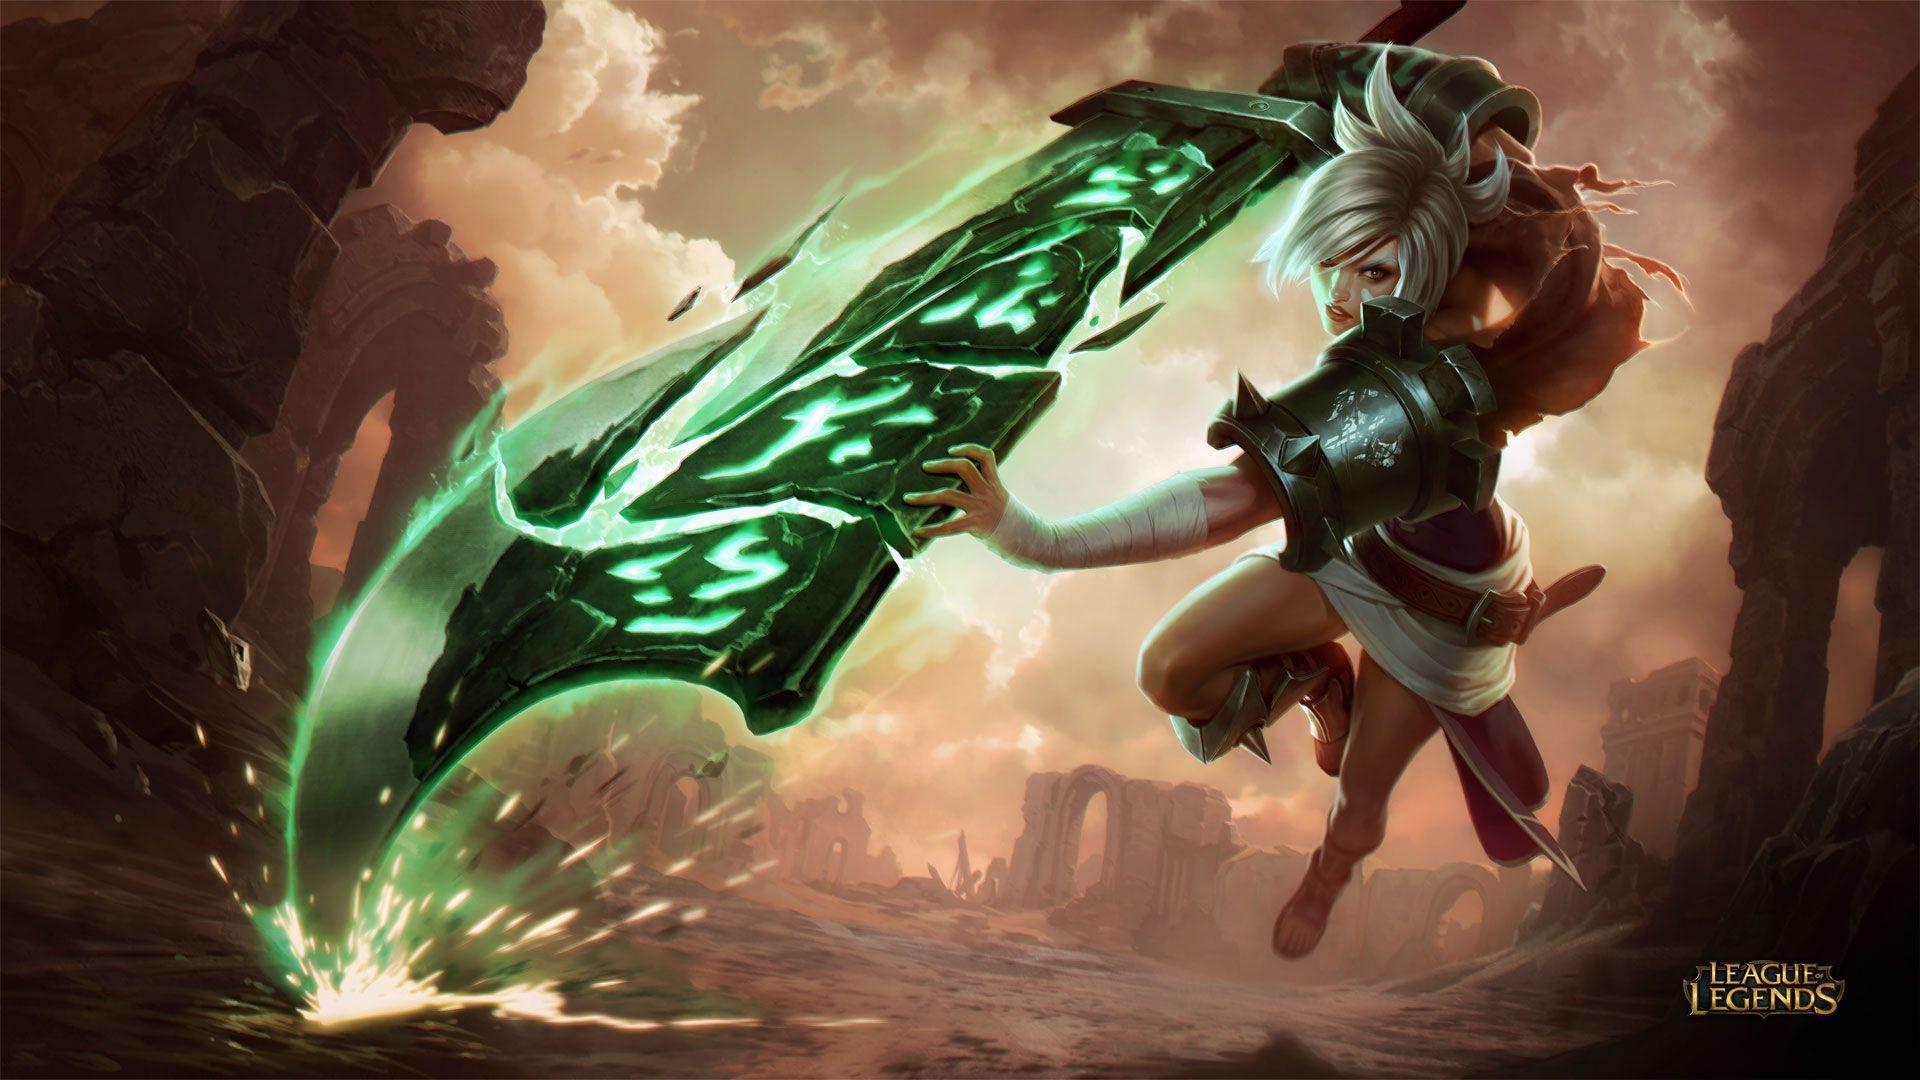 Riven Wallpaper - League of Legends Wallpapers